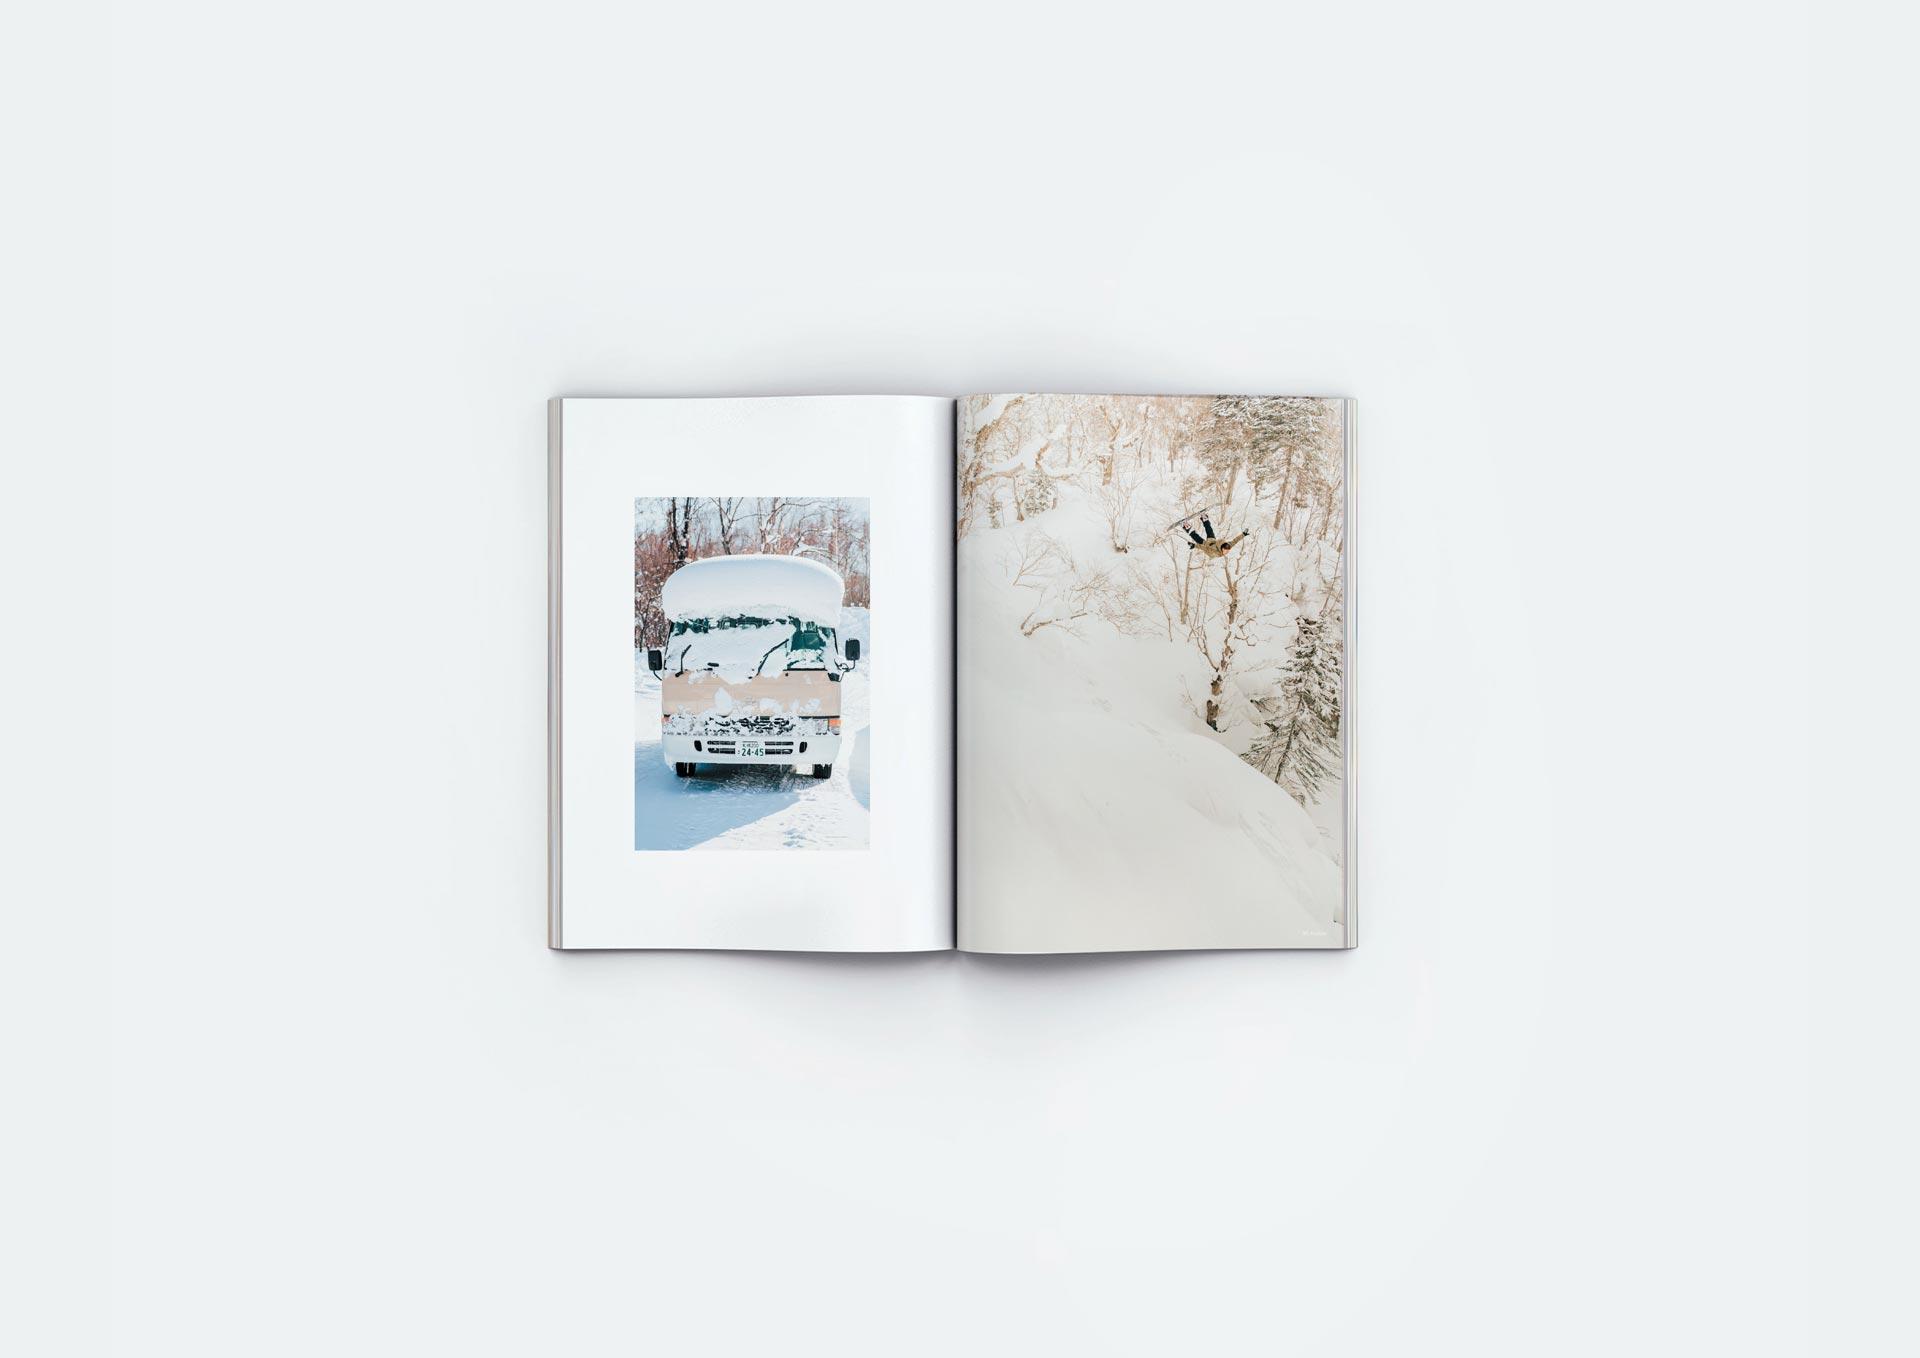 Vans First Layer Newspaper - Fotobuch